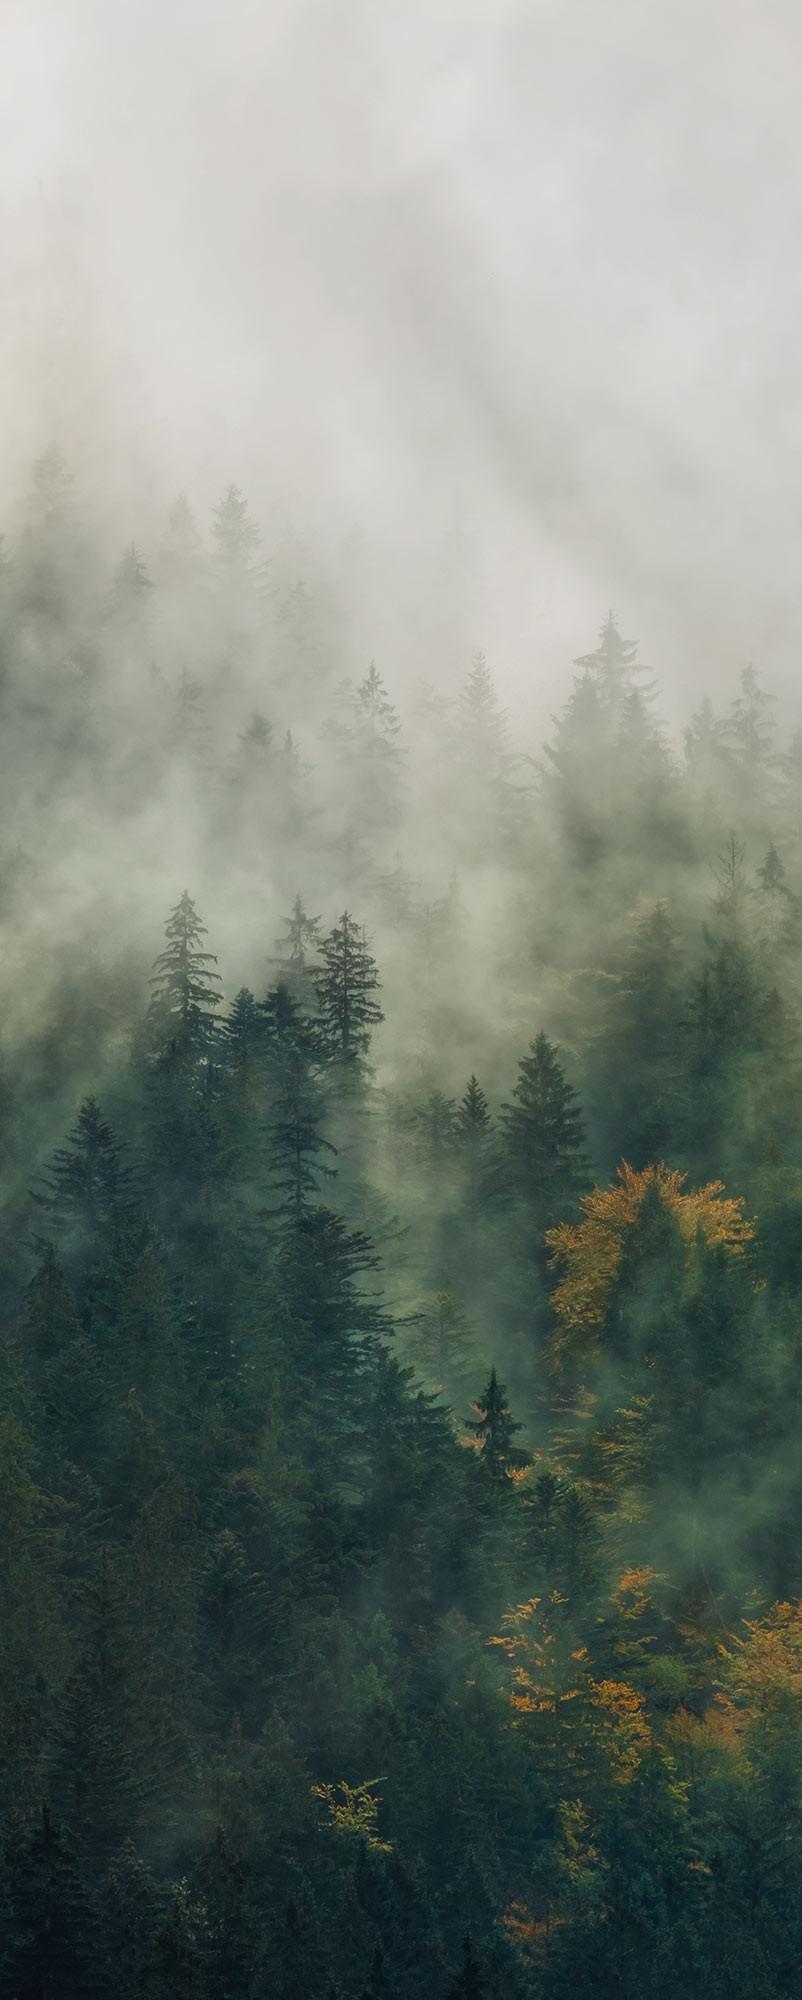 Tales of the Carpathians